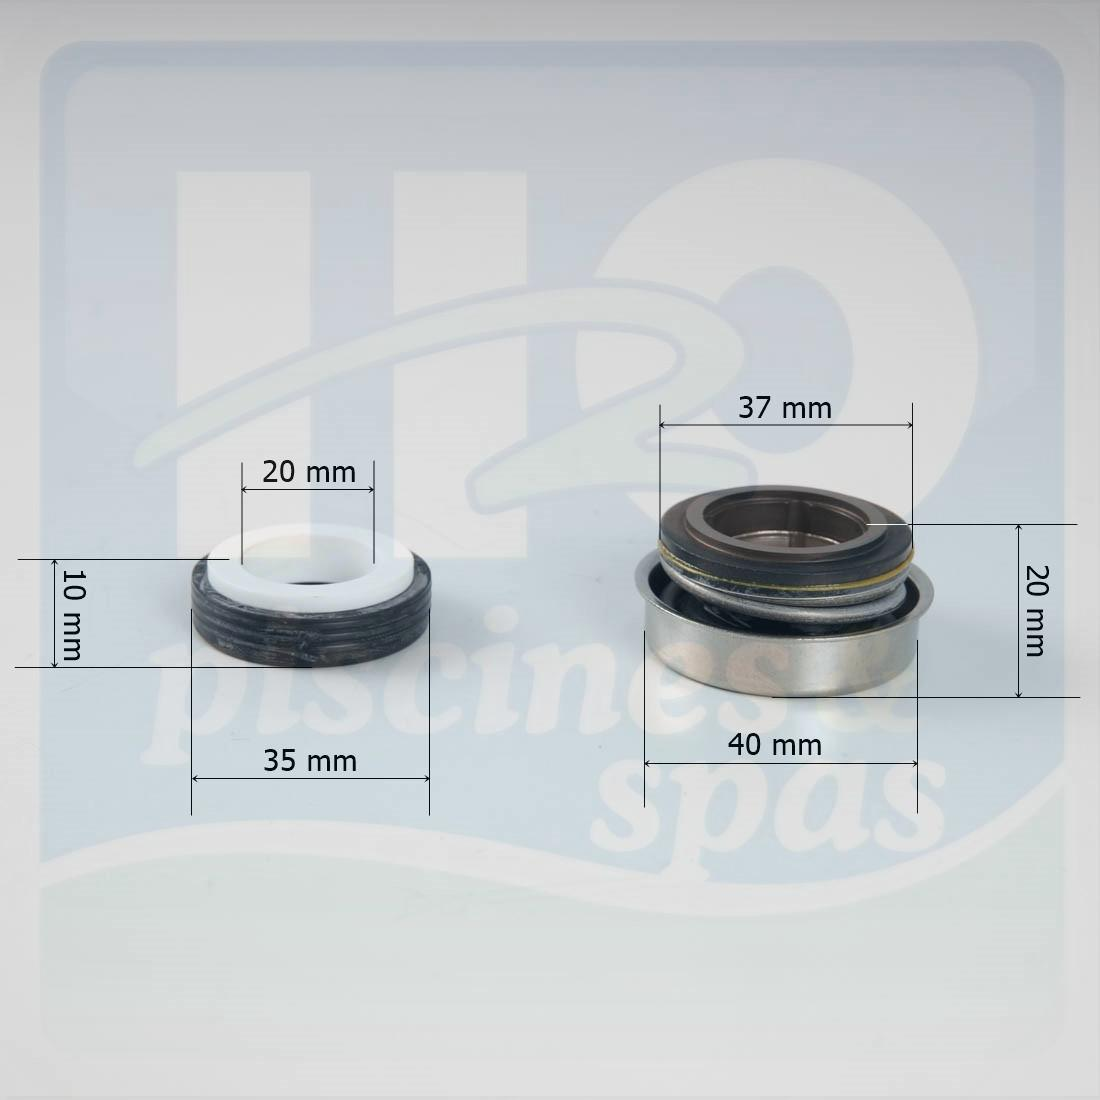 Garniture mcanique de pompe astral glass plus h2o piscines spas for Pompe piscine astral glass plus